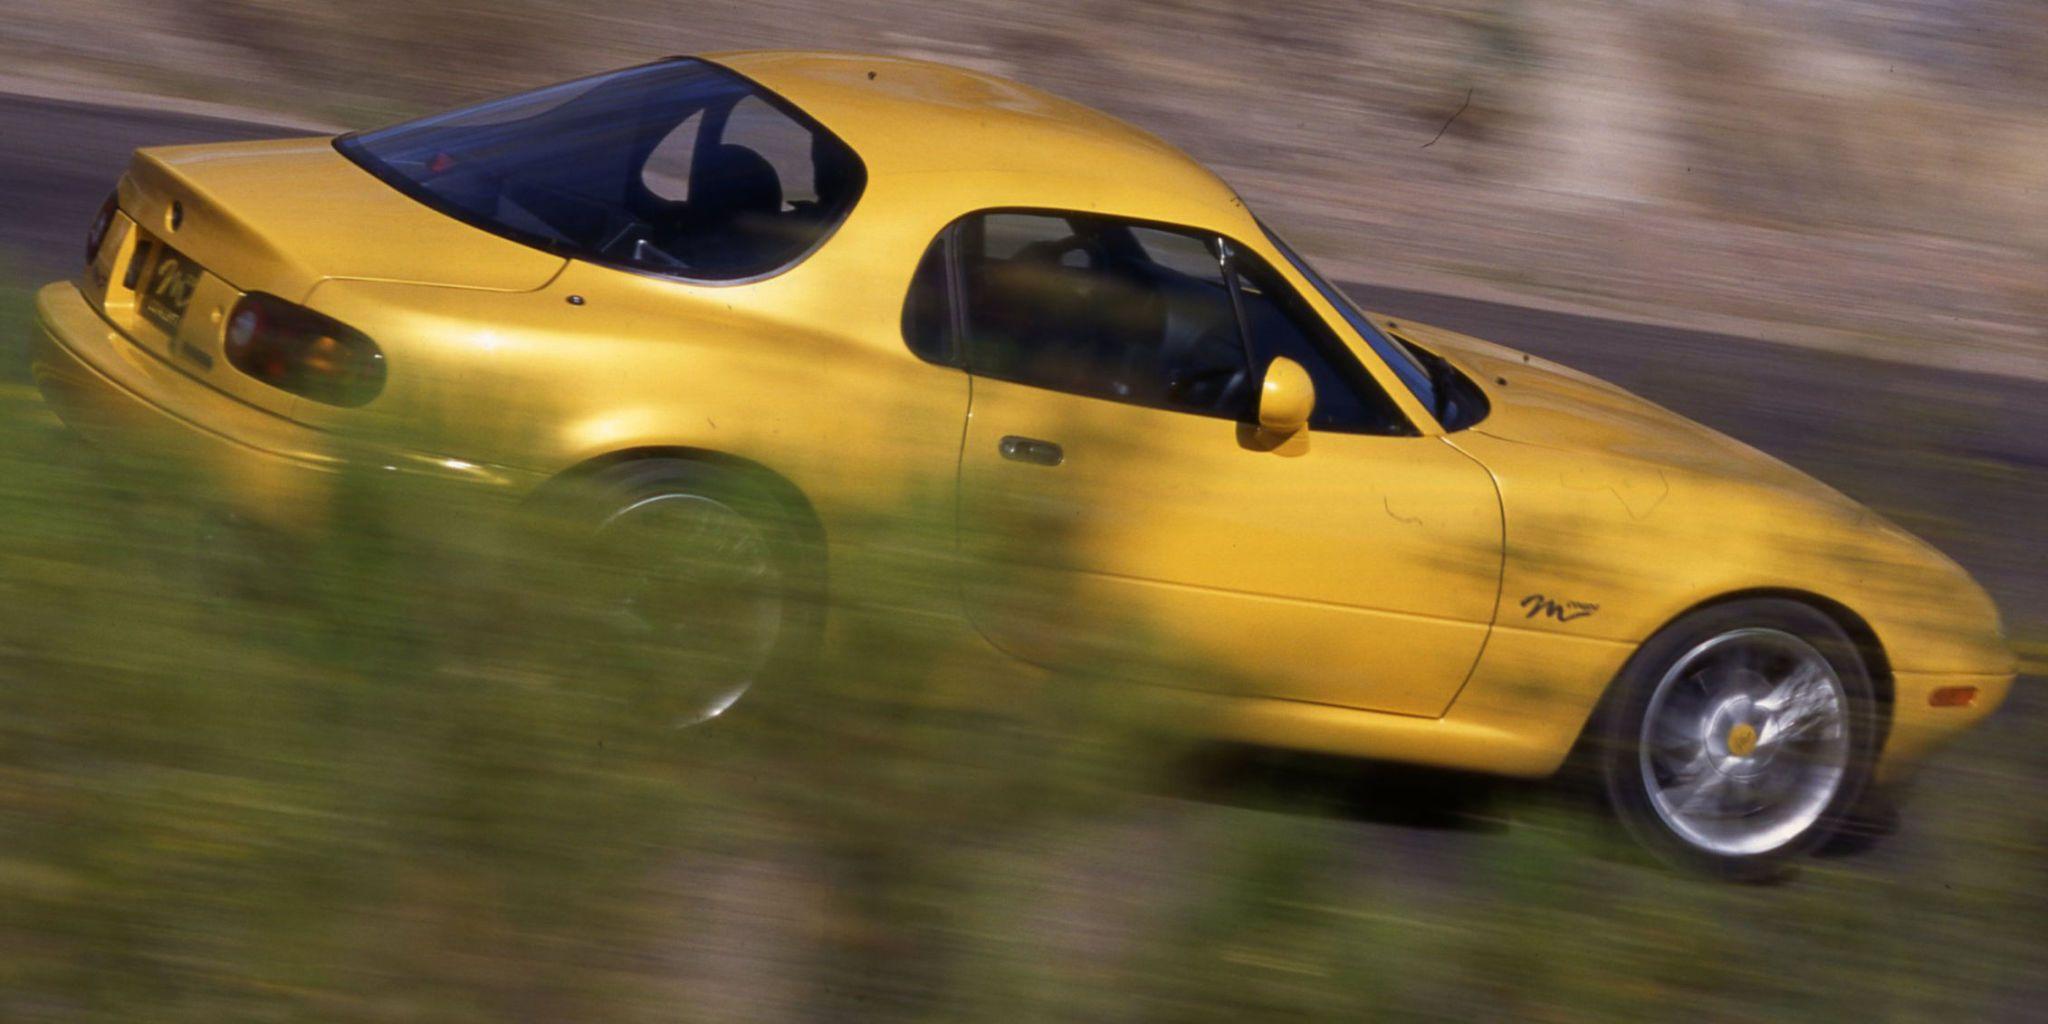 1996 Mazda Miata M Coupe - Flashback Drive Photos